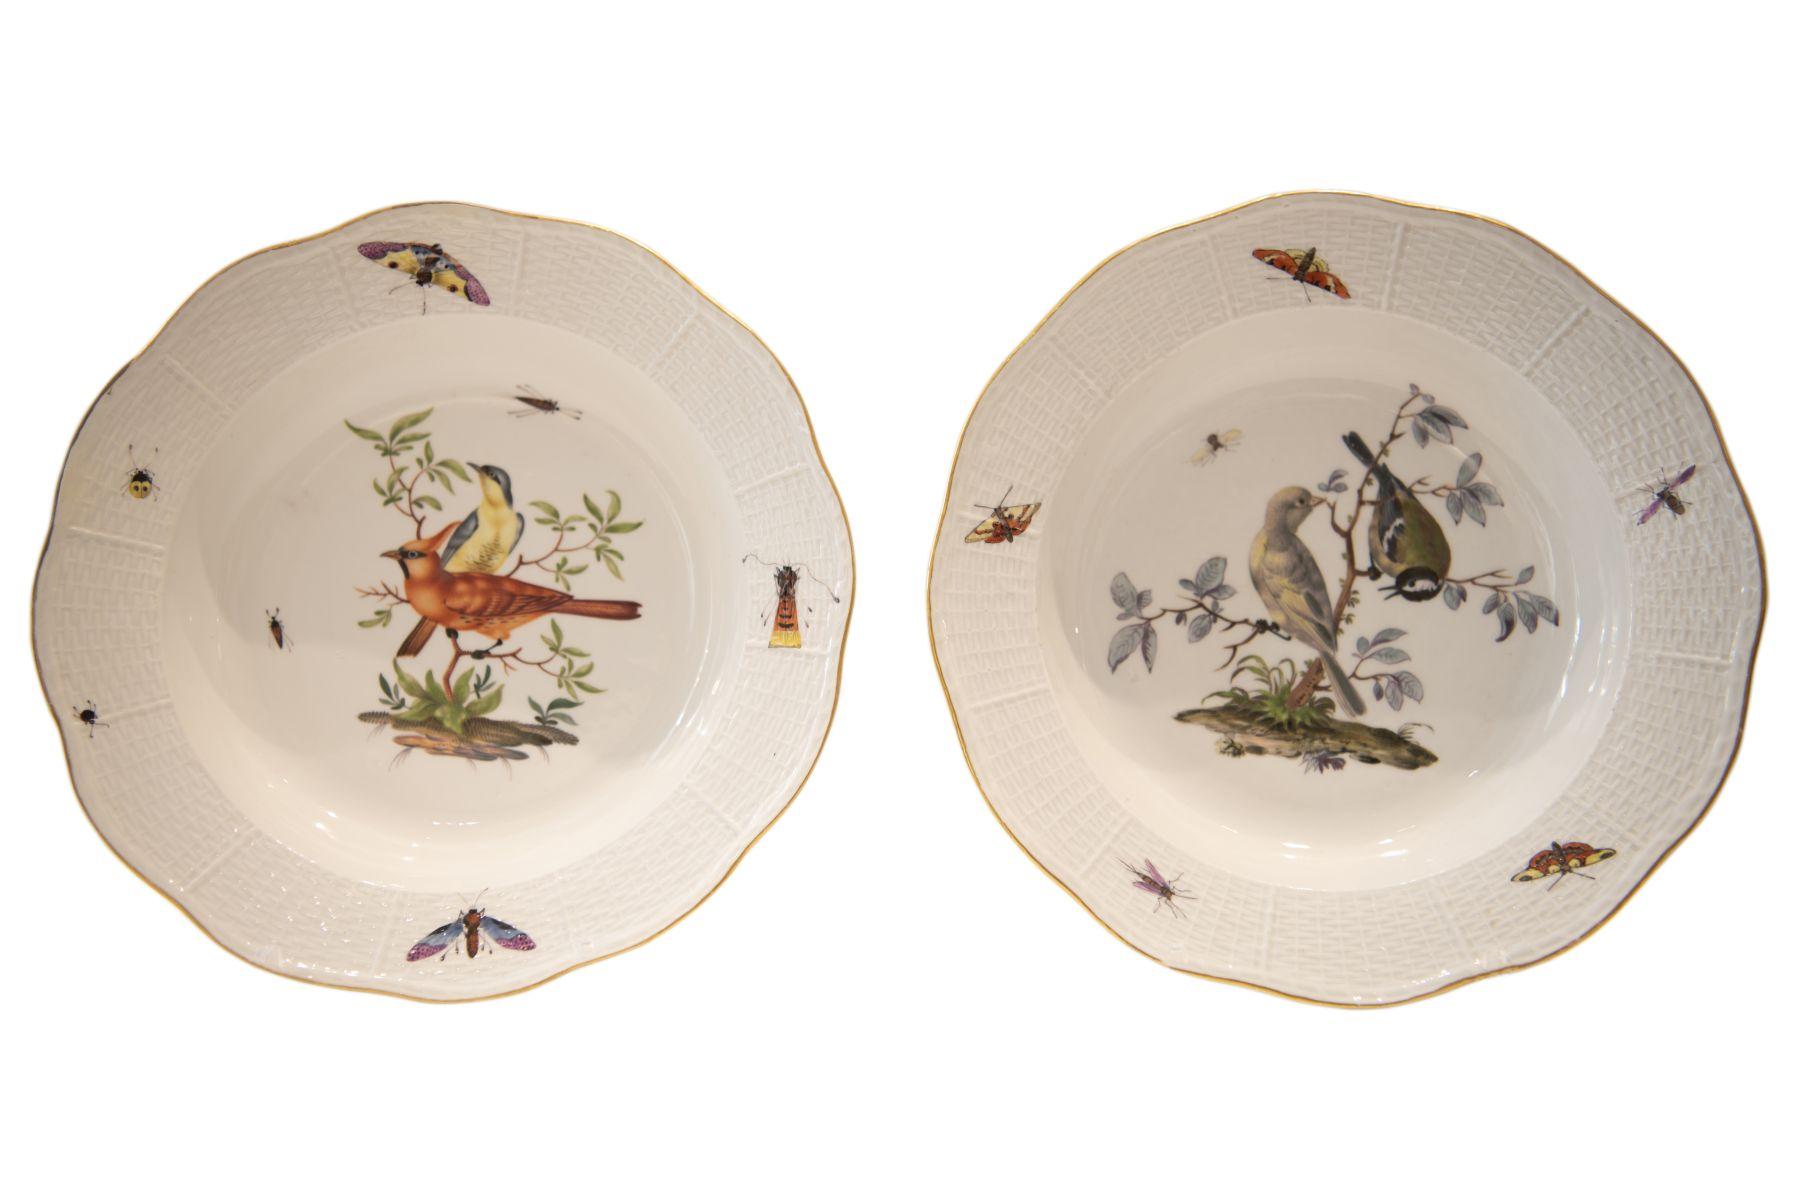 #273 2 Meissen soup plates   2 Suppenteller Meissen Image